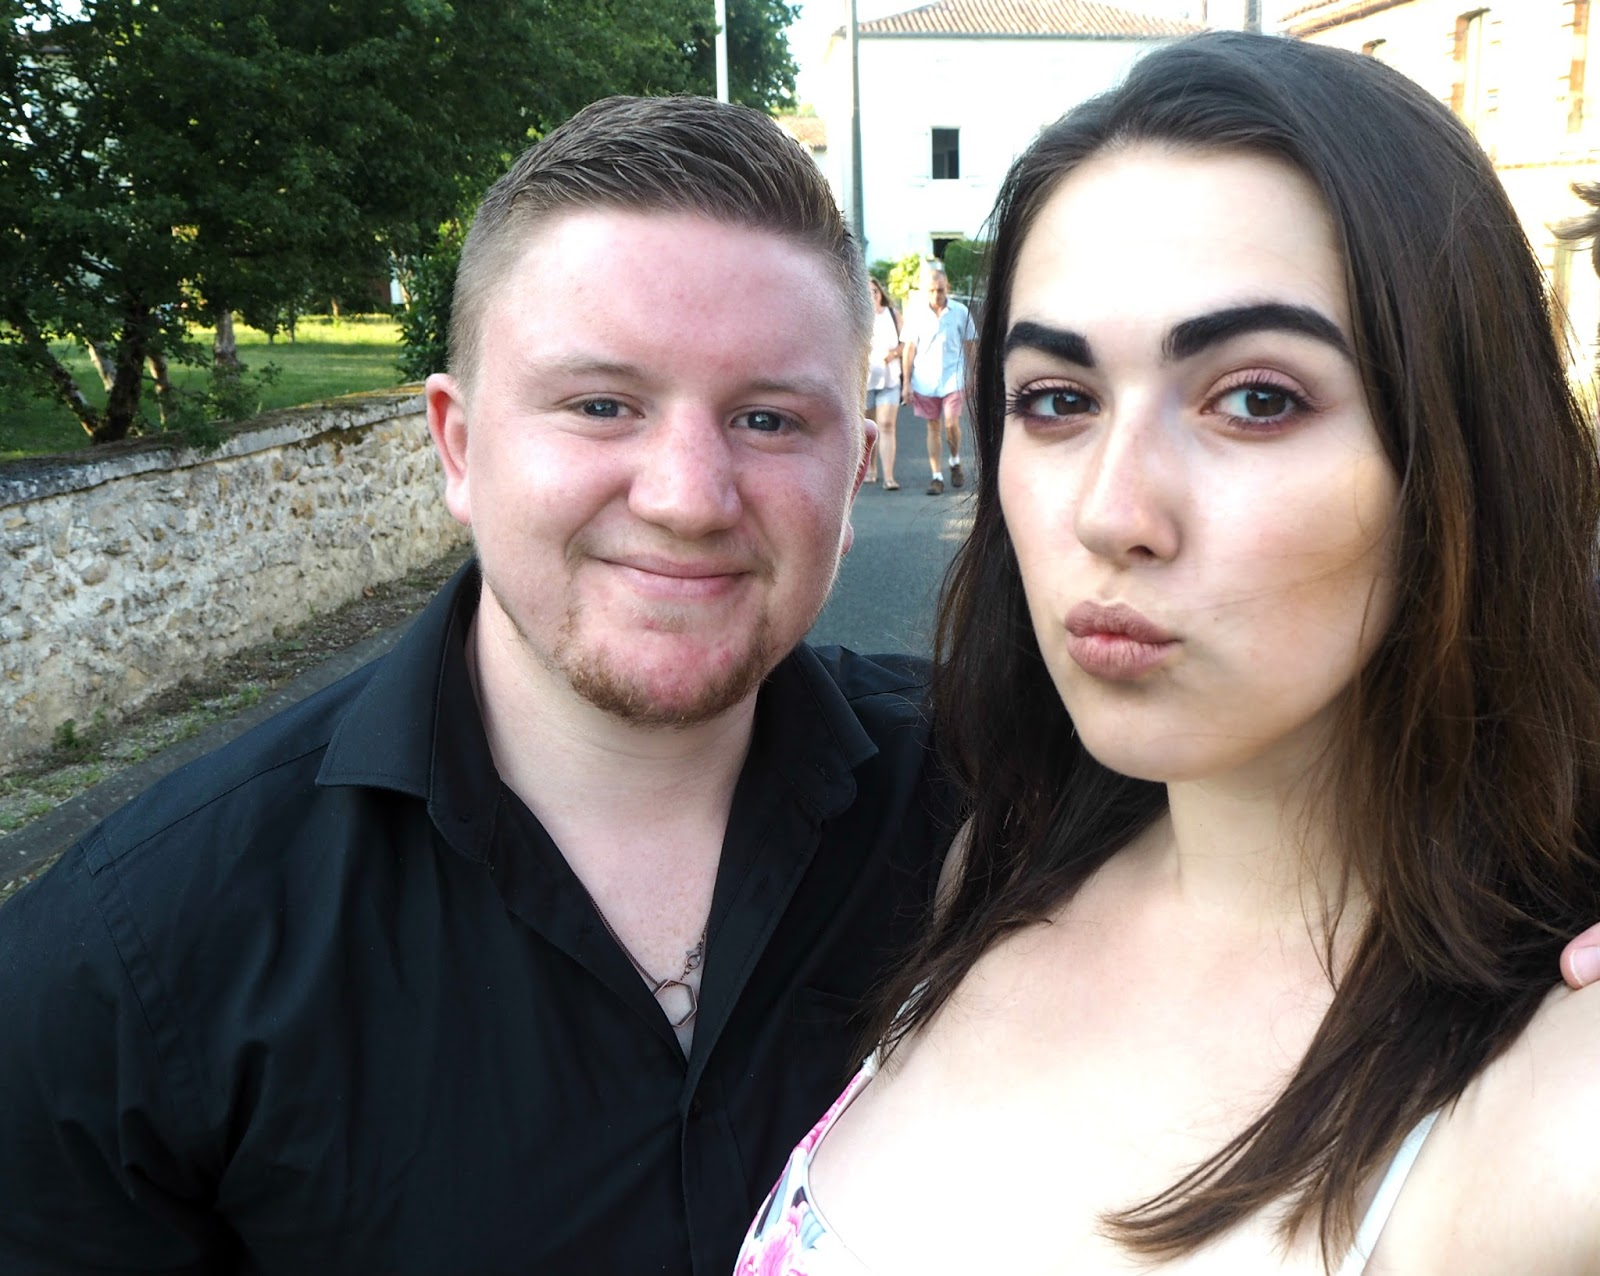 Sean and Natalie